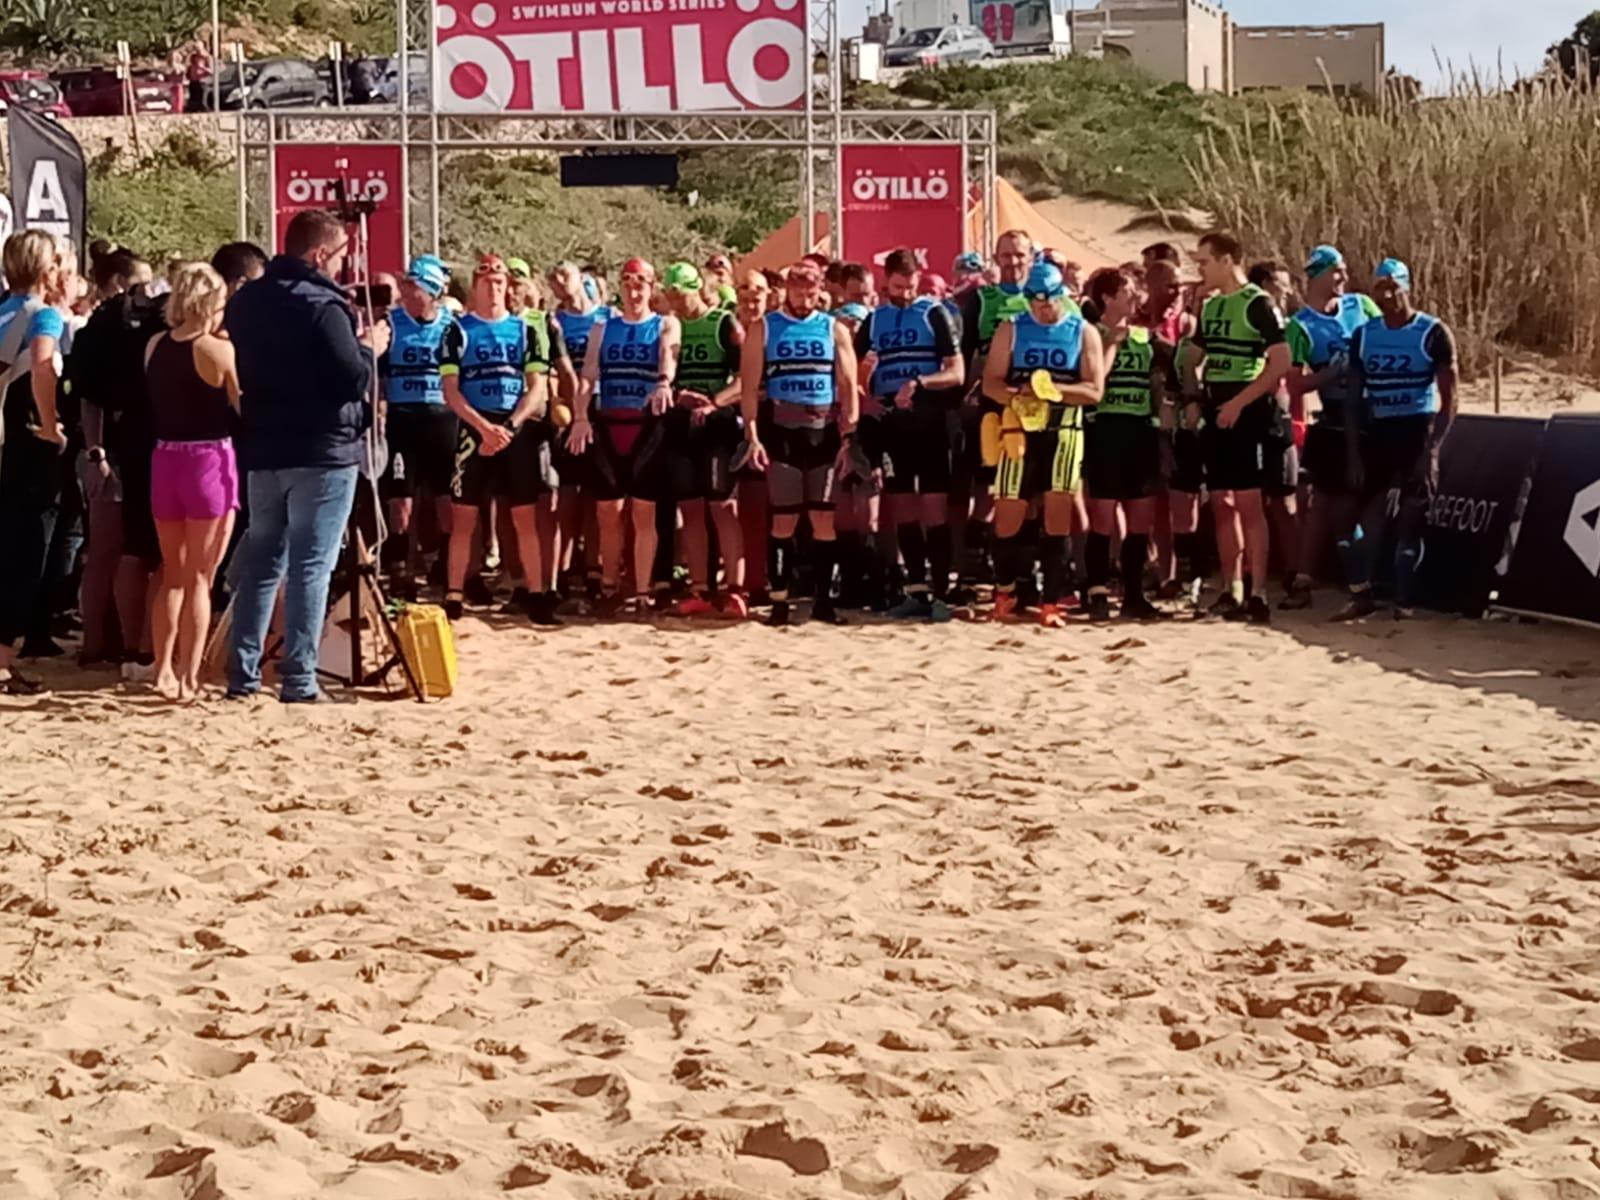 SwimRun Malta Sprint - Foto: SRG